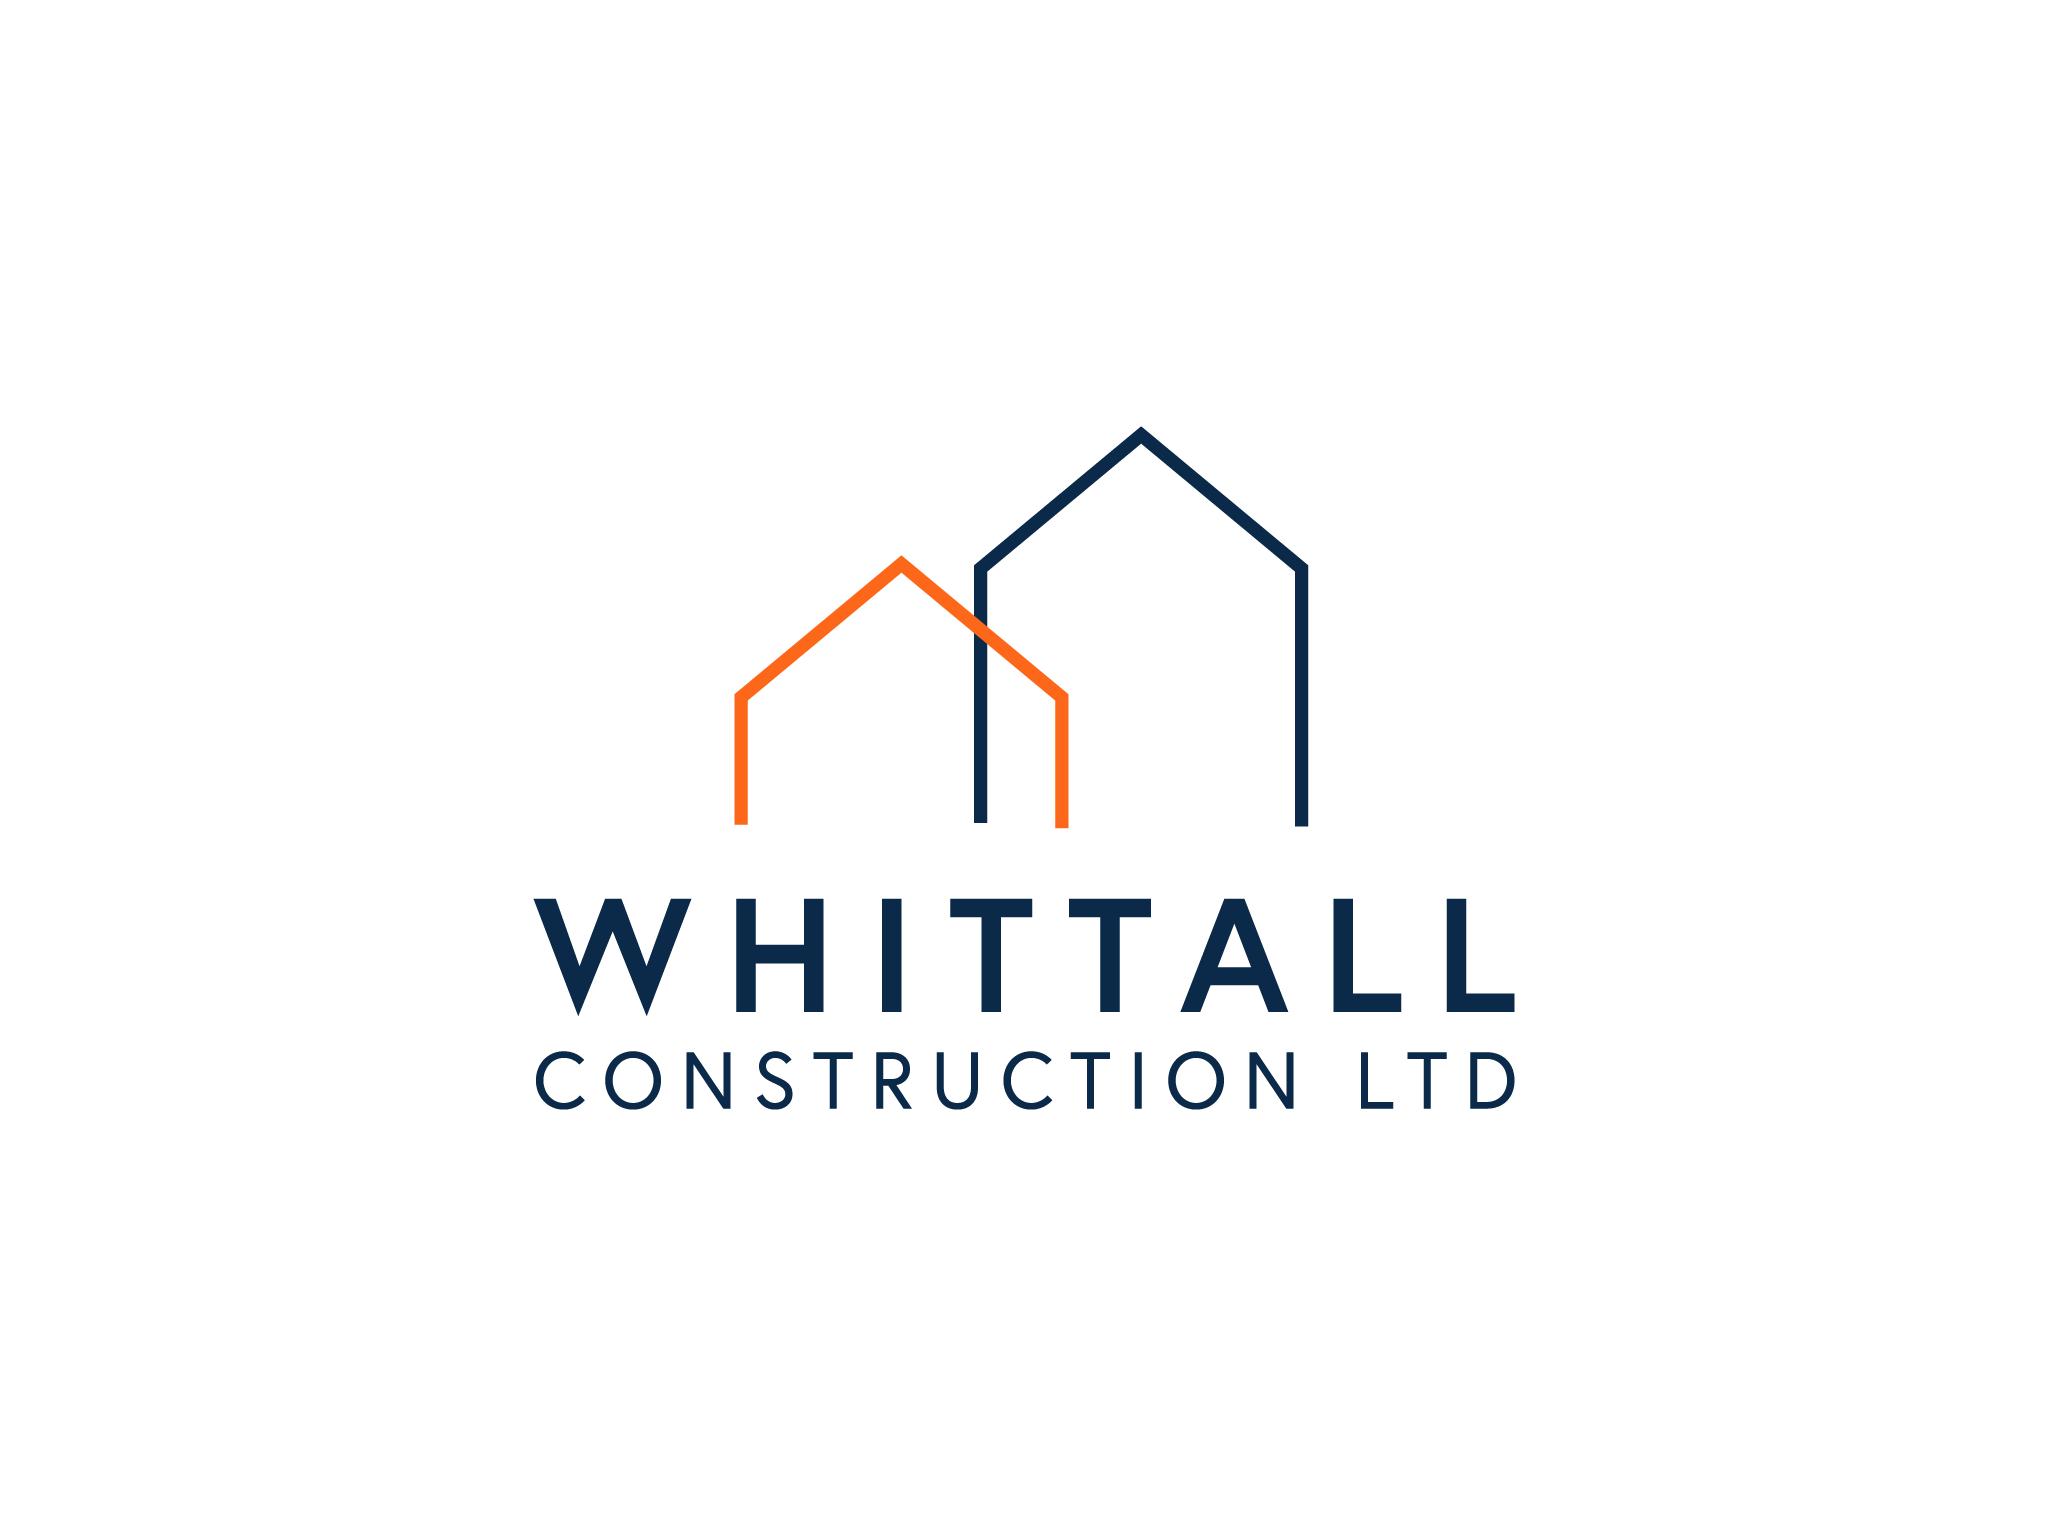 Lisa+Claire+Stewart+Design+Whittall+Construction+Logo+Branding1.png